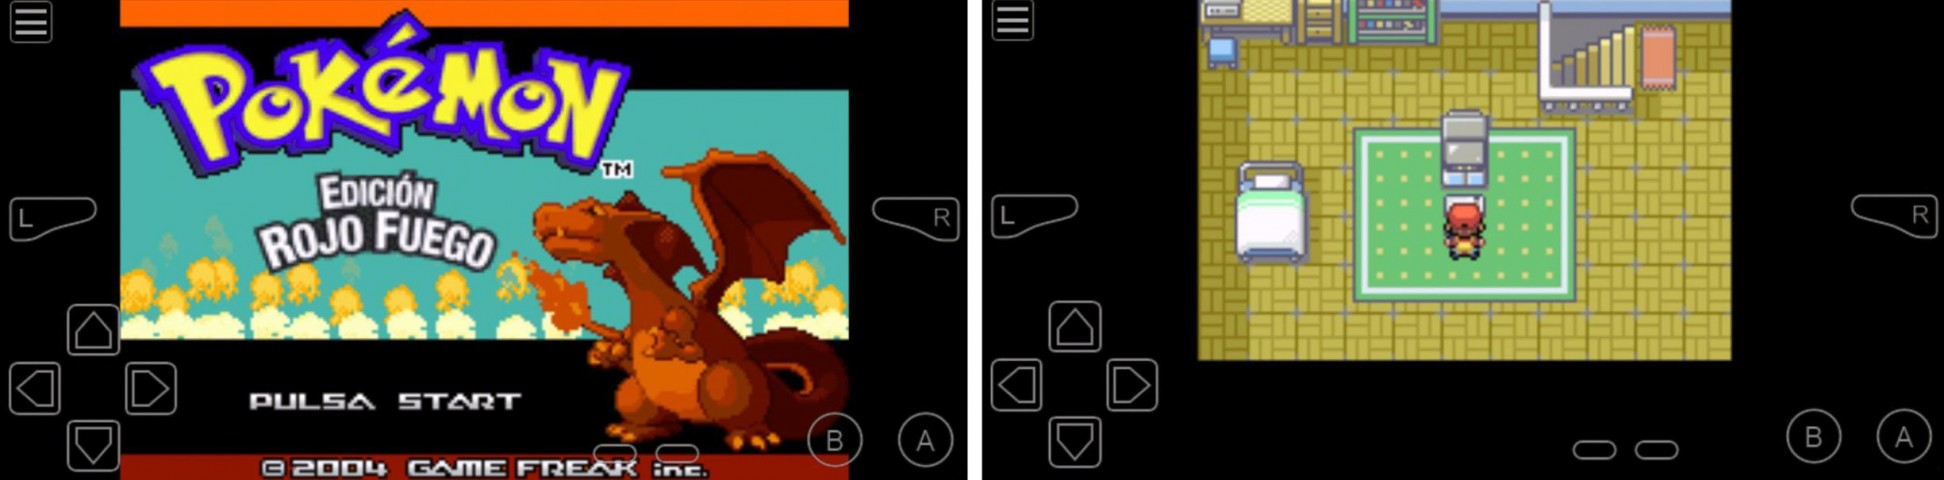 pokemon-fire-red-apk.jpg